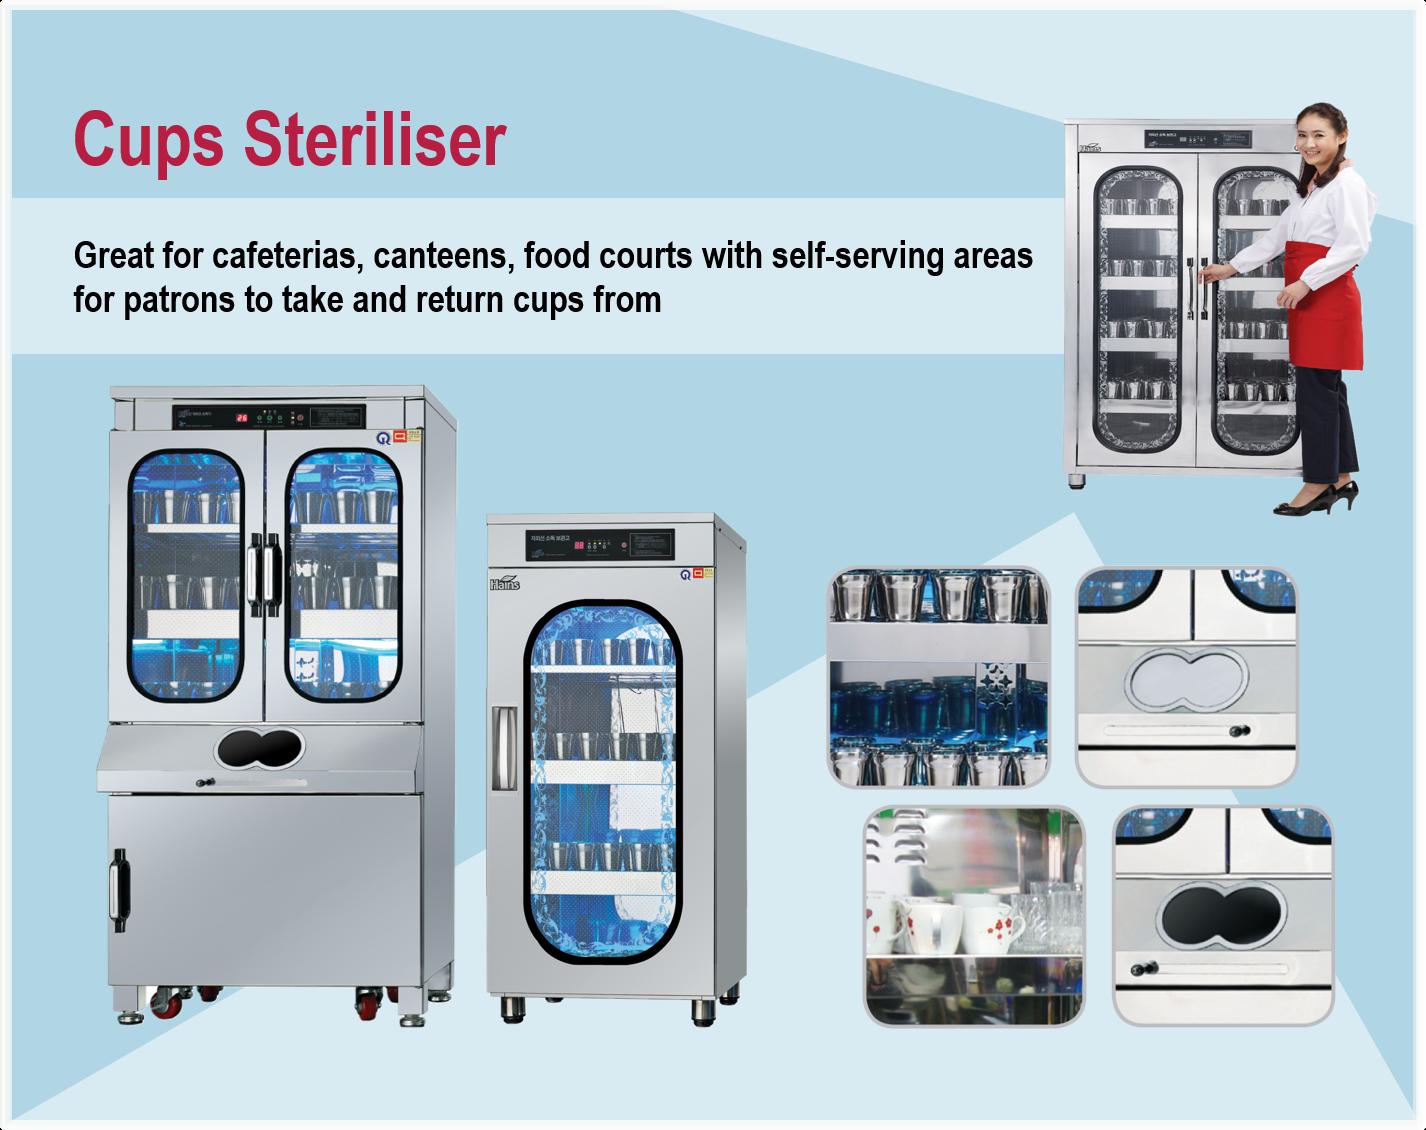 Cups Steriliser